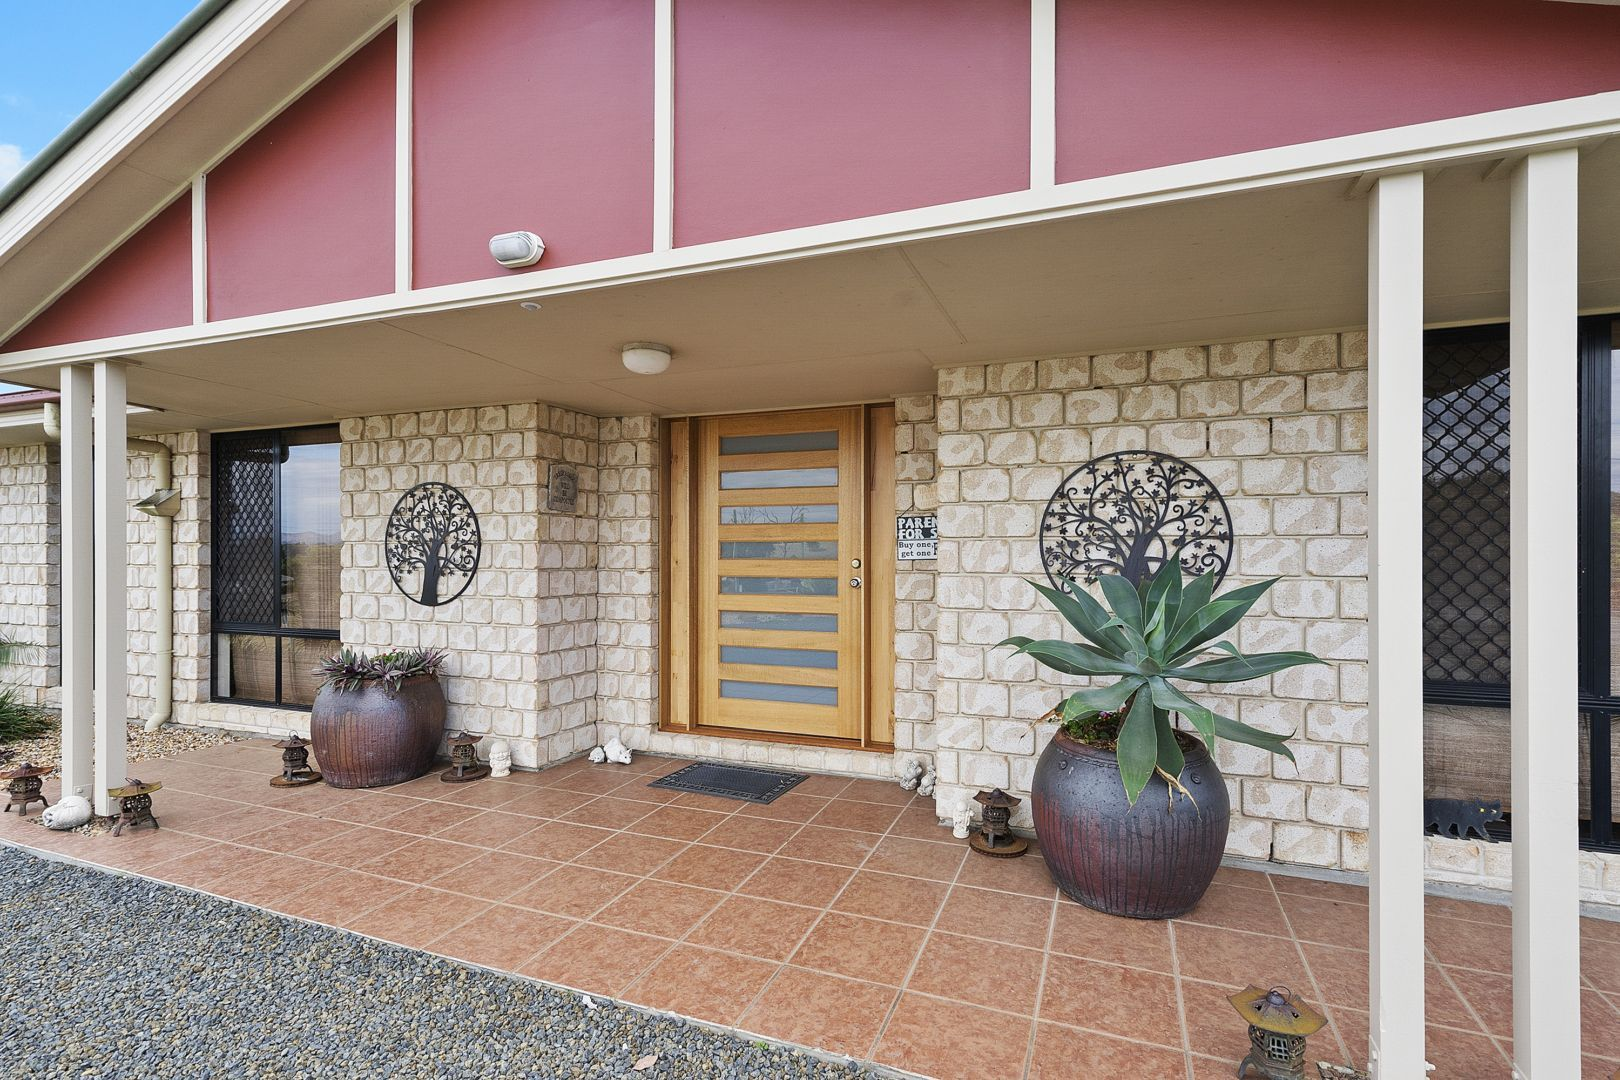 56-62 Worip Drive, Veresdale Scrub QLD 4285, Image 1